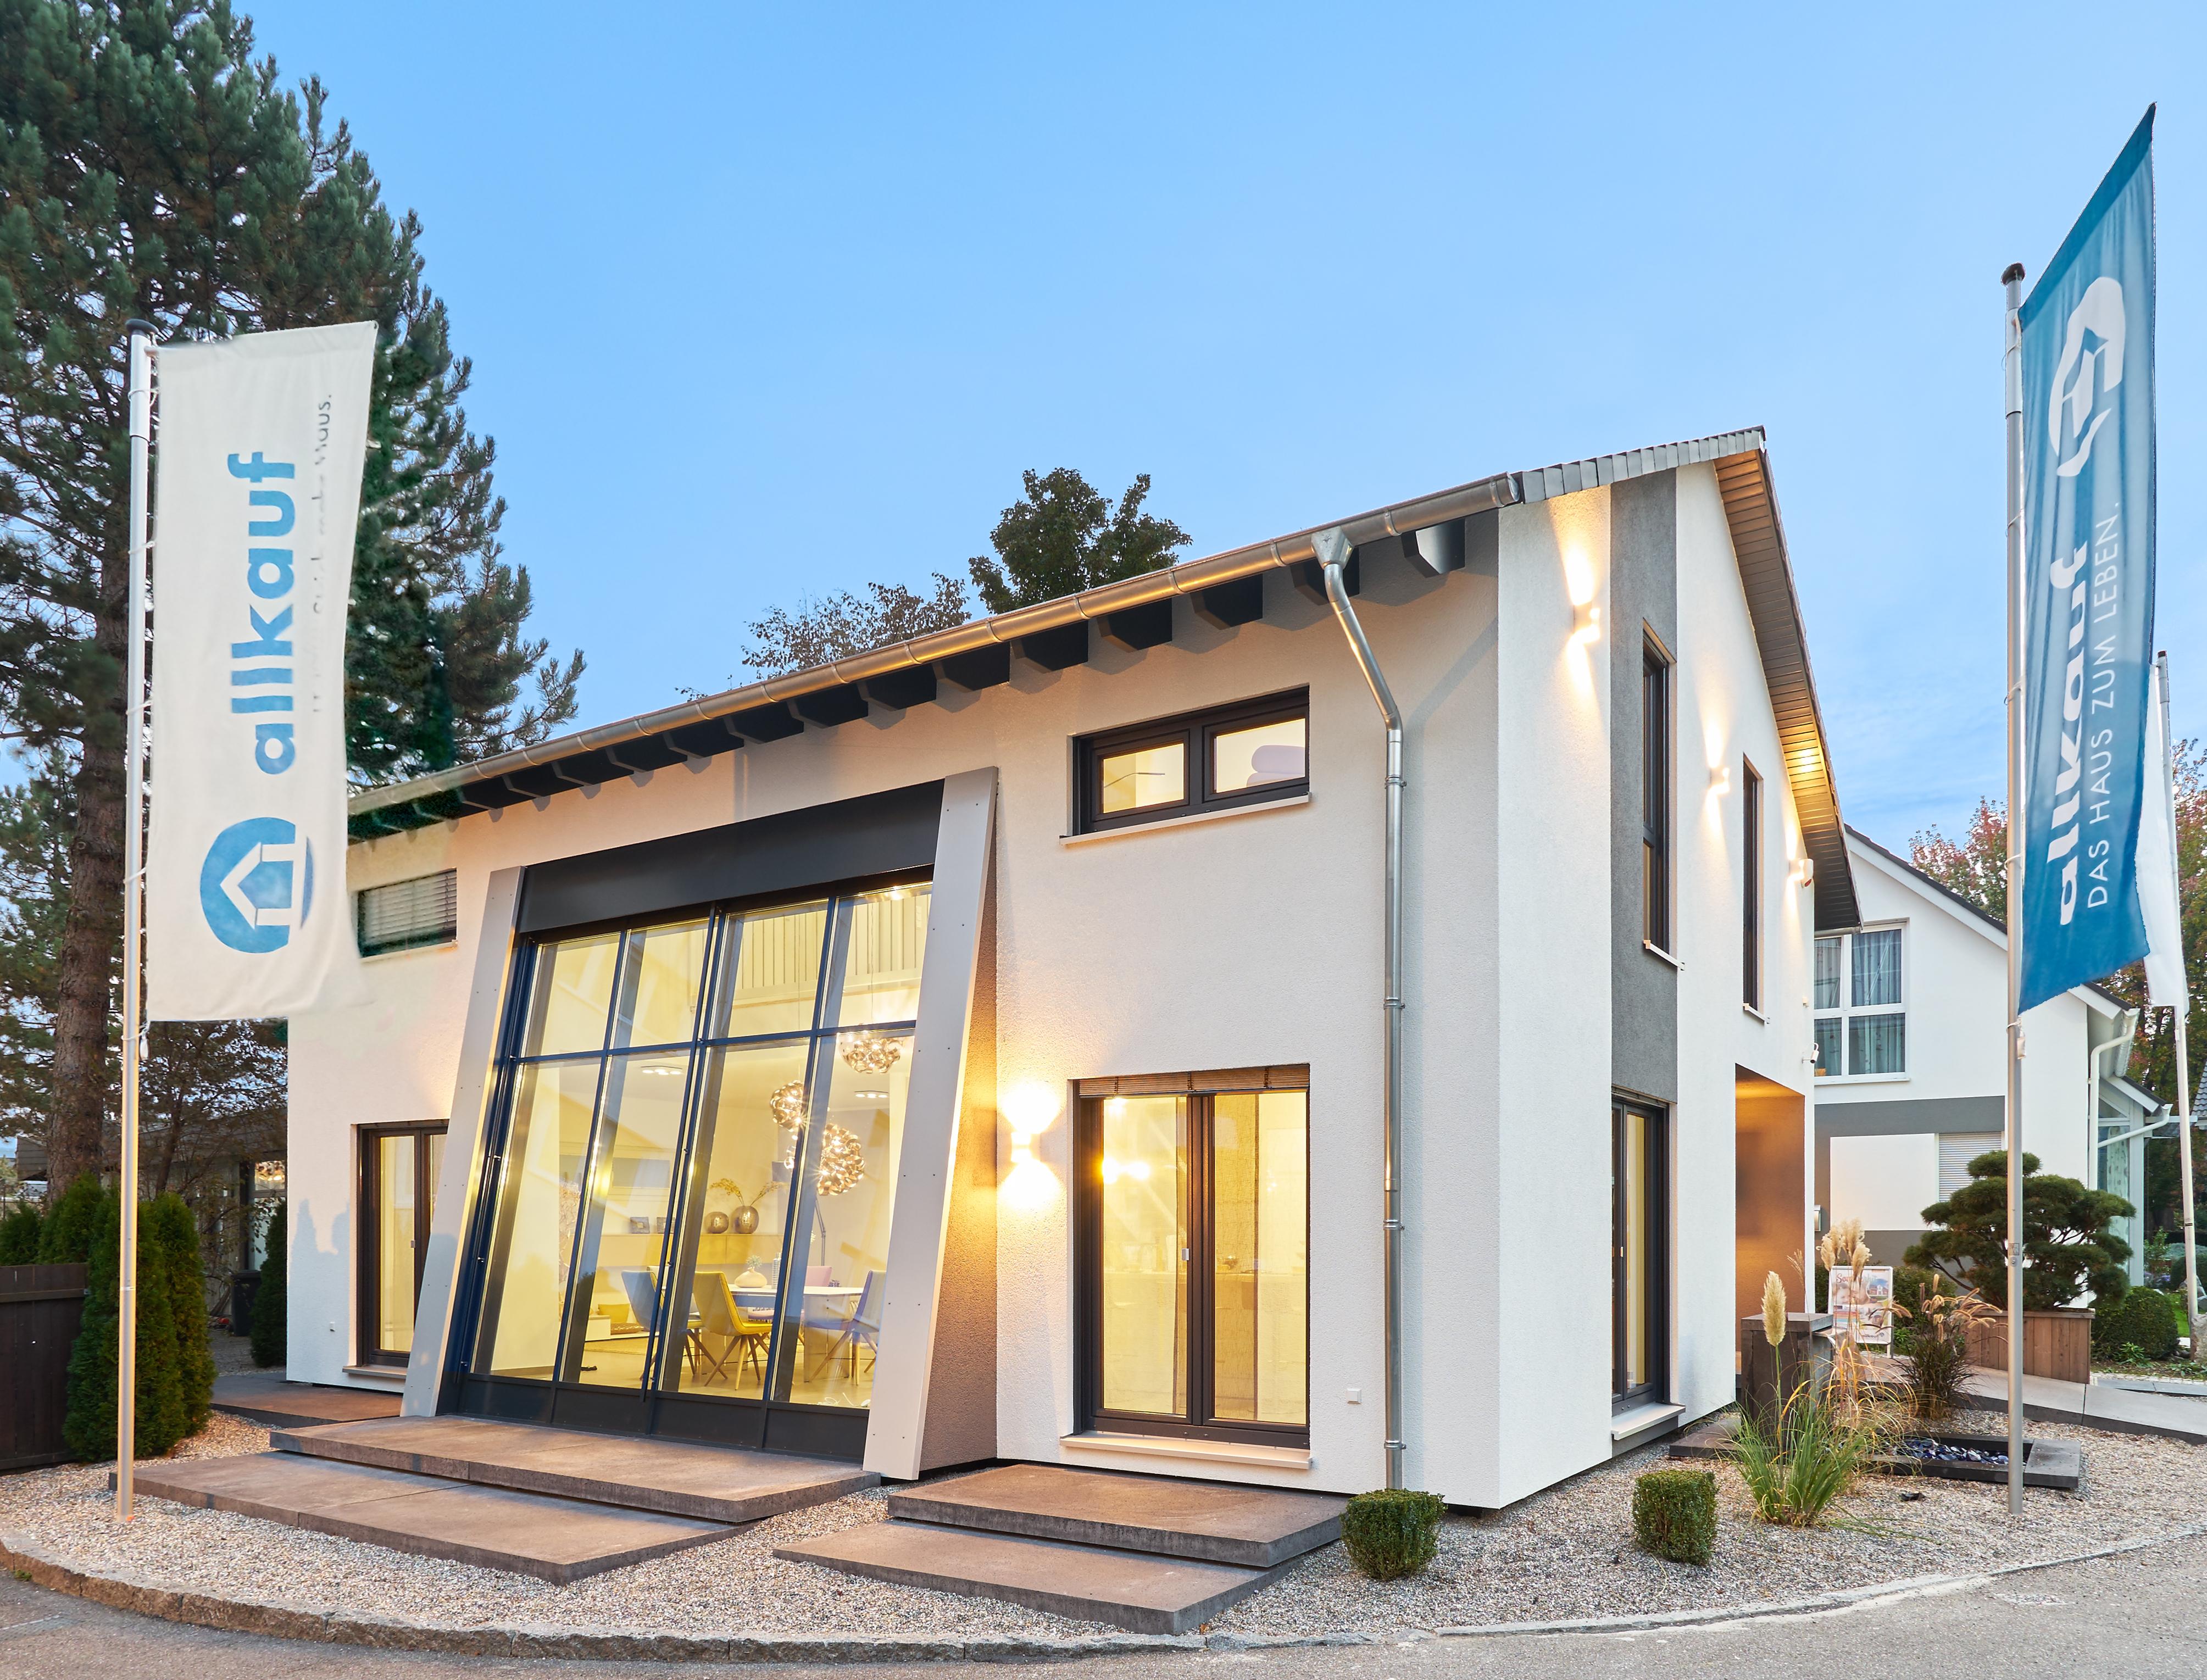 allkauf haus - Musterhaus Fellbach